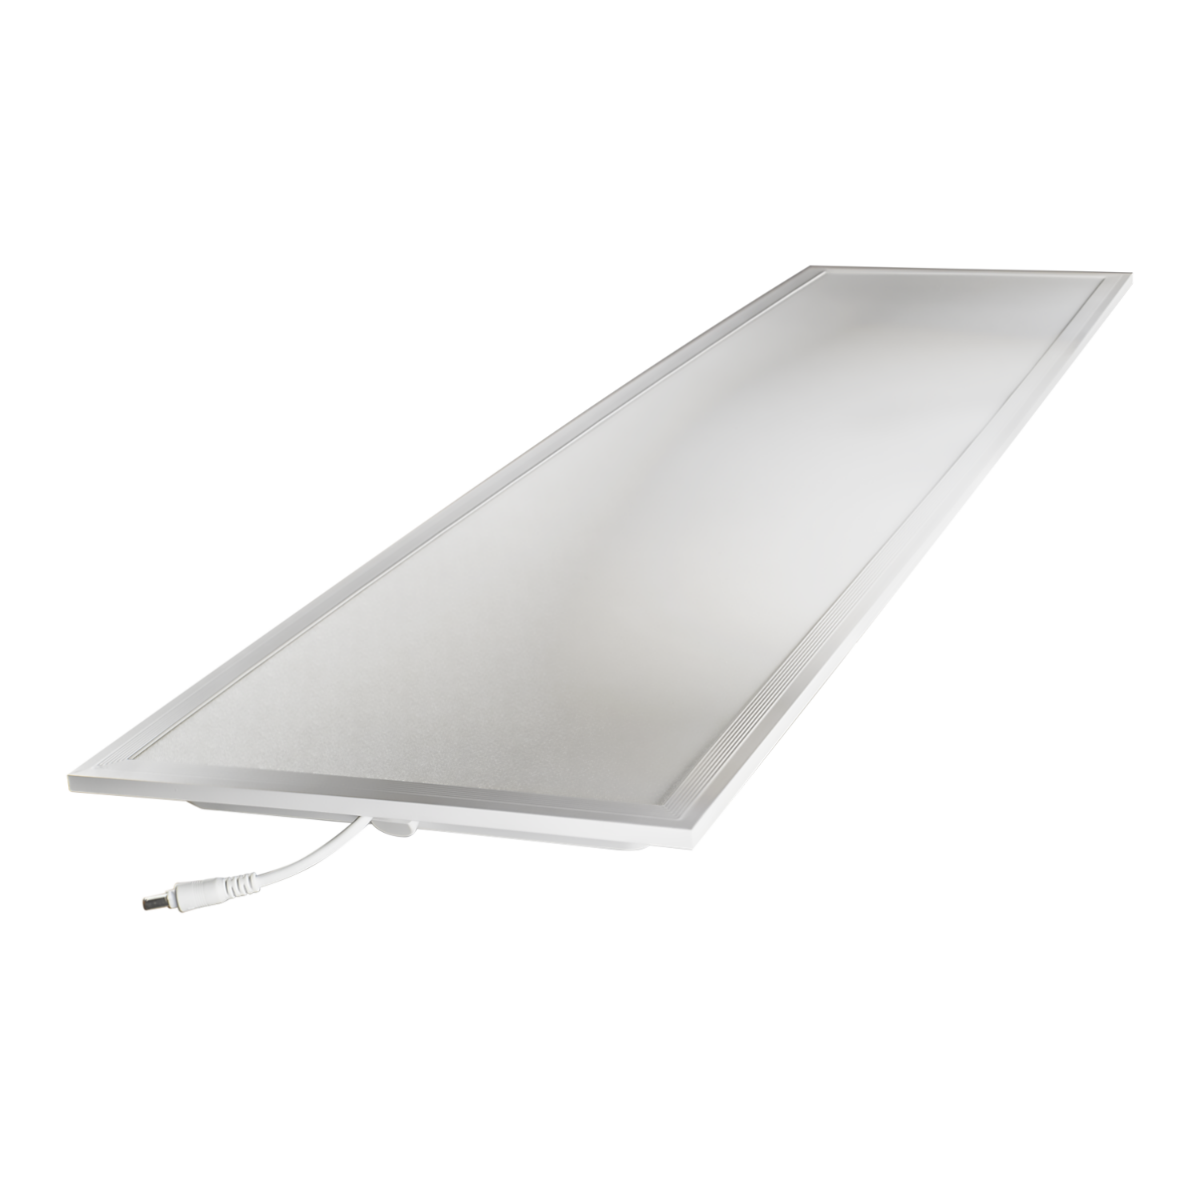 Noxion LED Paneeli Delta Pro Highlum V2.0 Xitanium DALI 40W 30x120cm 4000K 5480lm UGR <19 | Dali Himmennettävä - Kylmä Valkoinen - Korvaa 2x36W